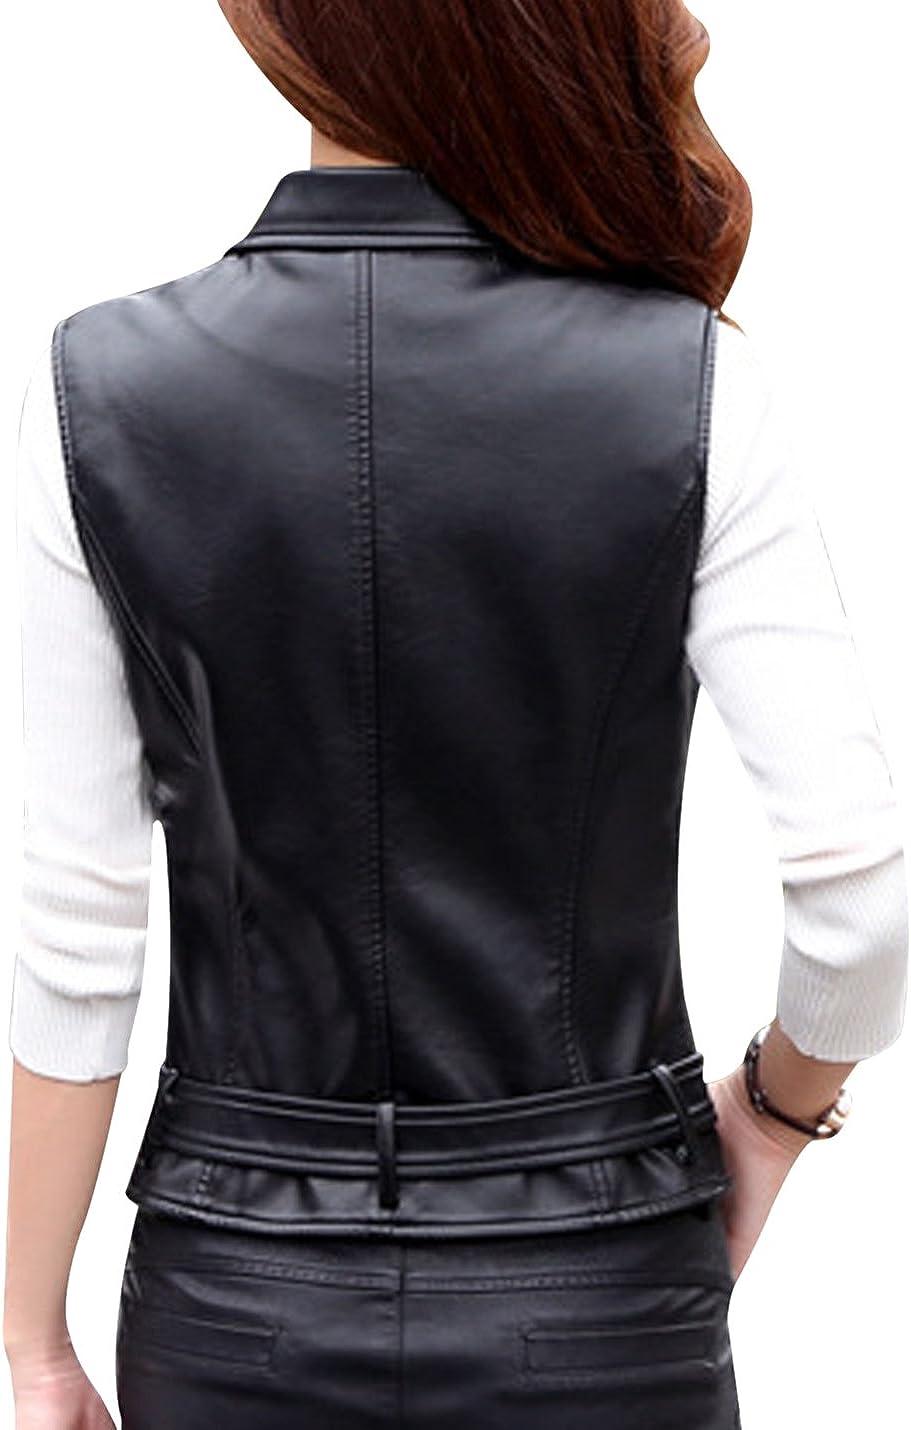 Uaneo Women's Notch Lapel Zip Up Faux Leather Motorcycle Short Belted Jacket Vest (Black, Large)